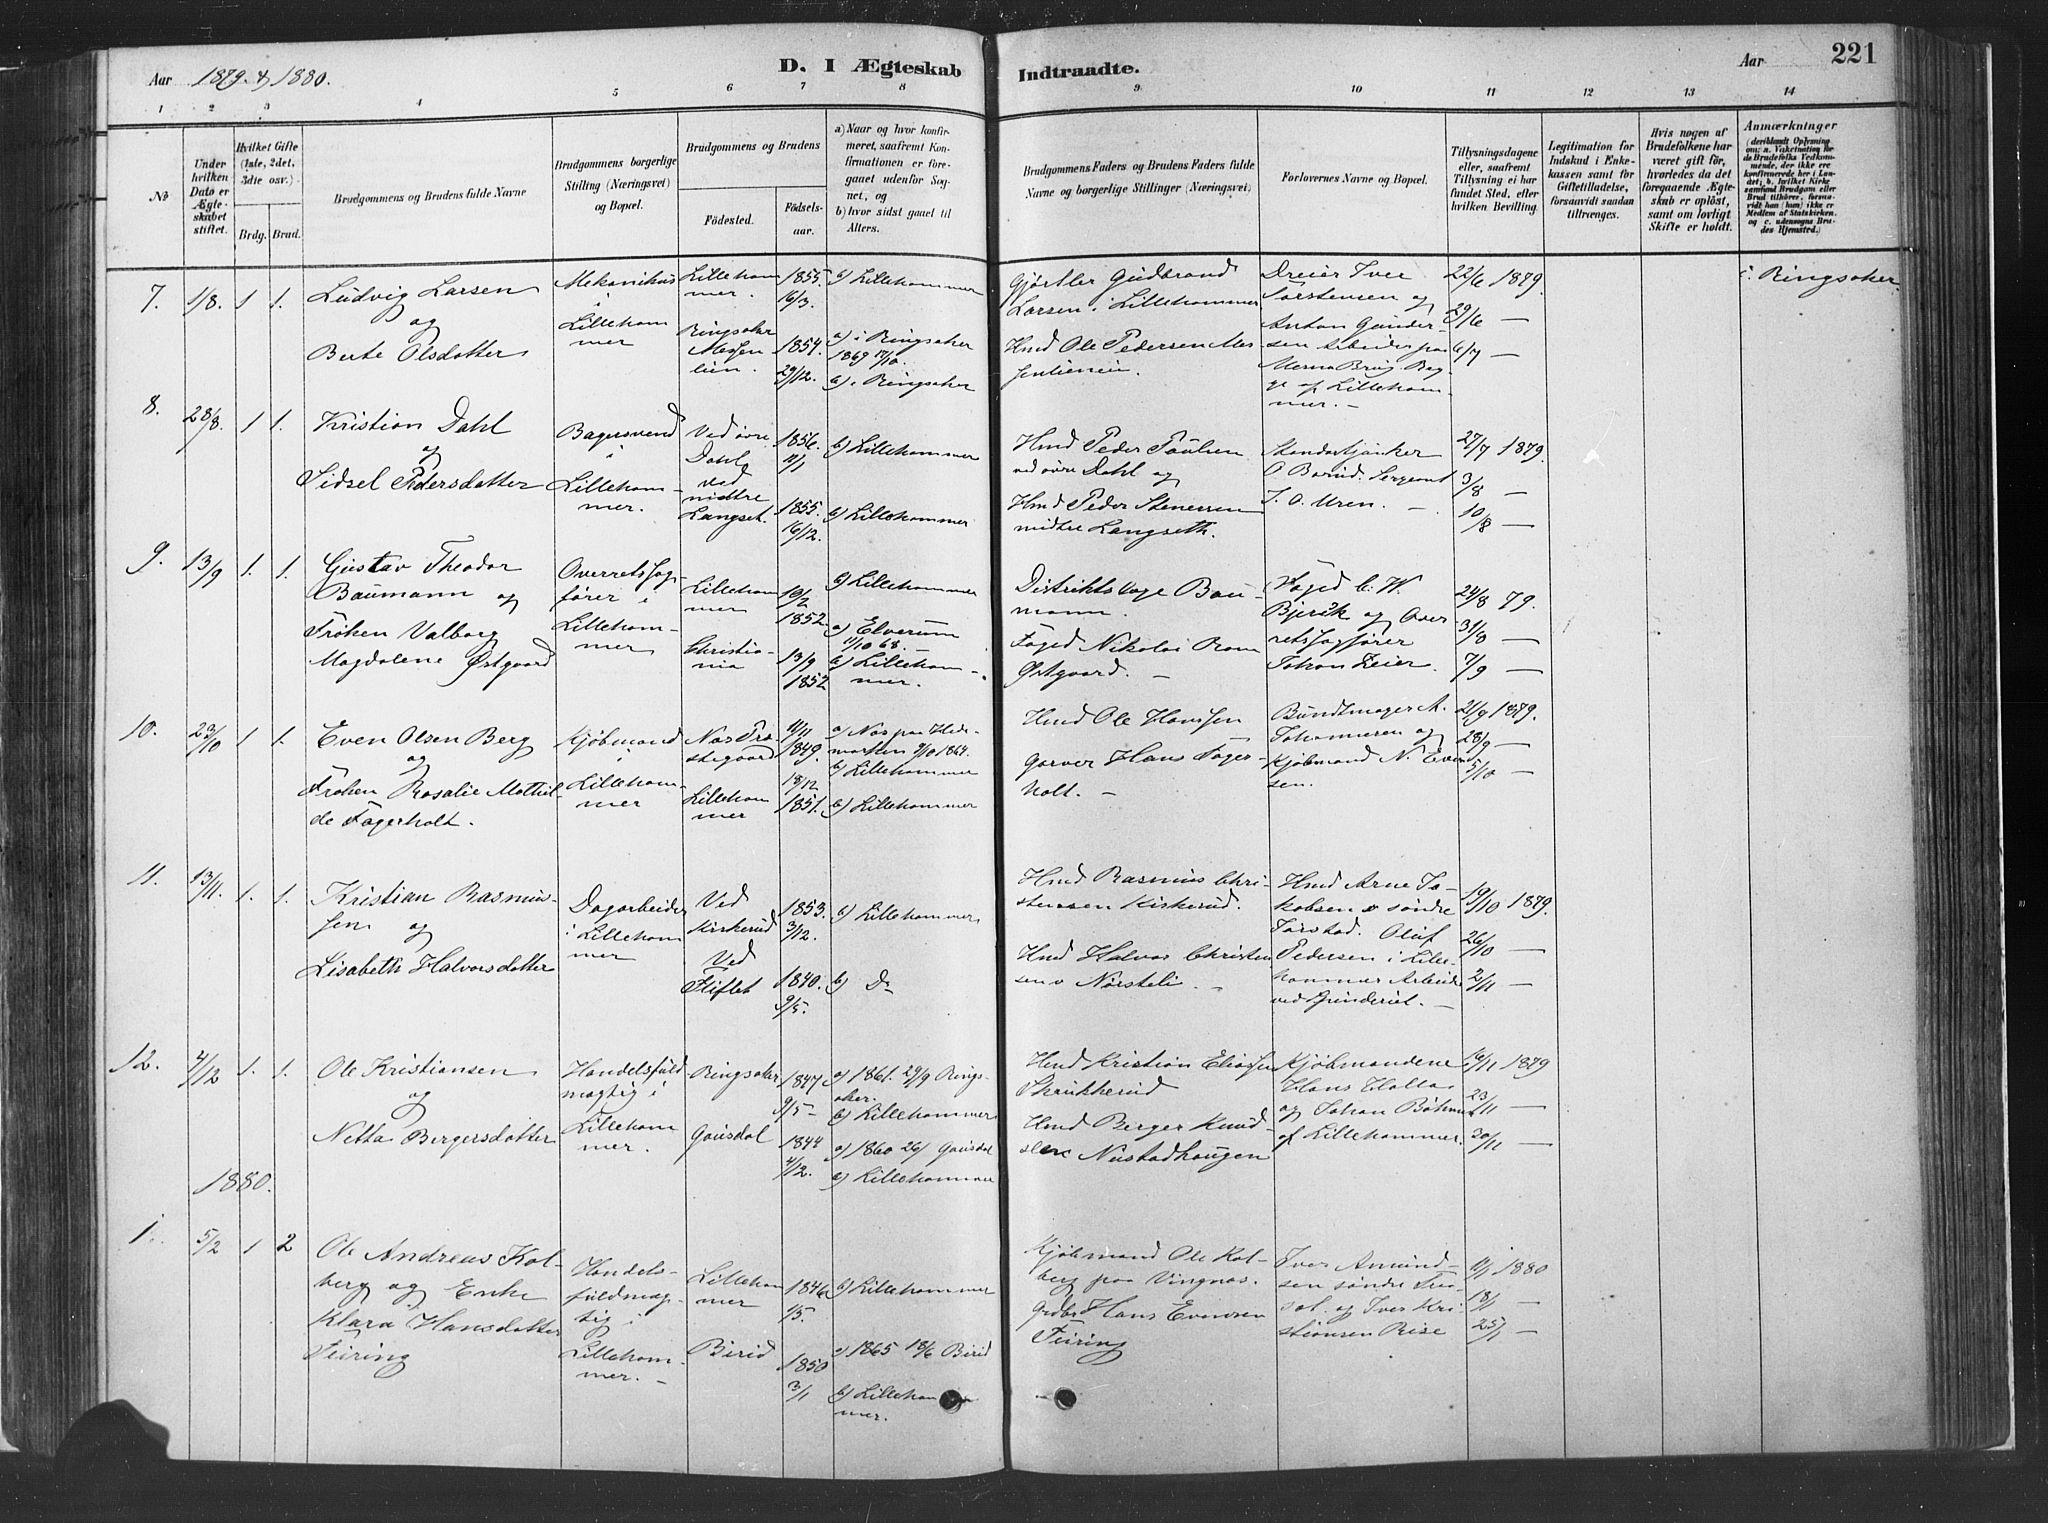 SAH, Fåberg prestekontor, Ministerialbok nr. 10, 1879-1900, s. 221